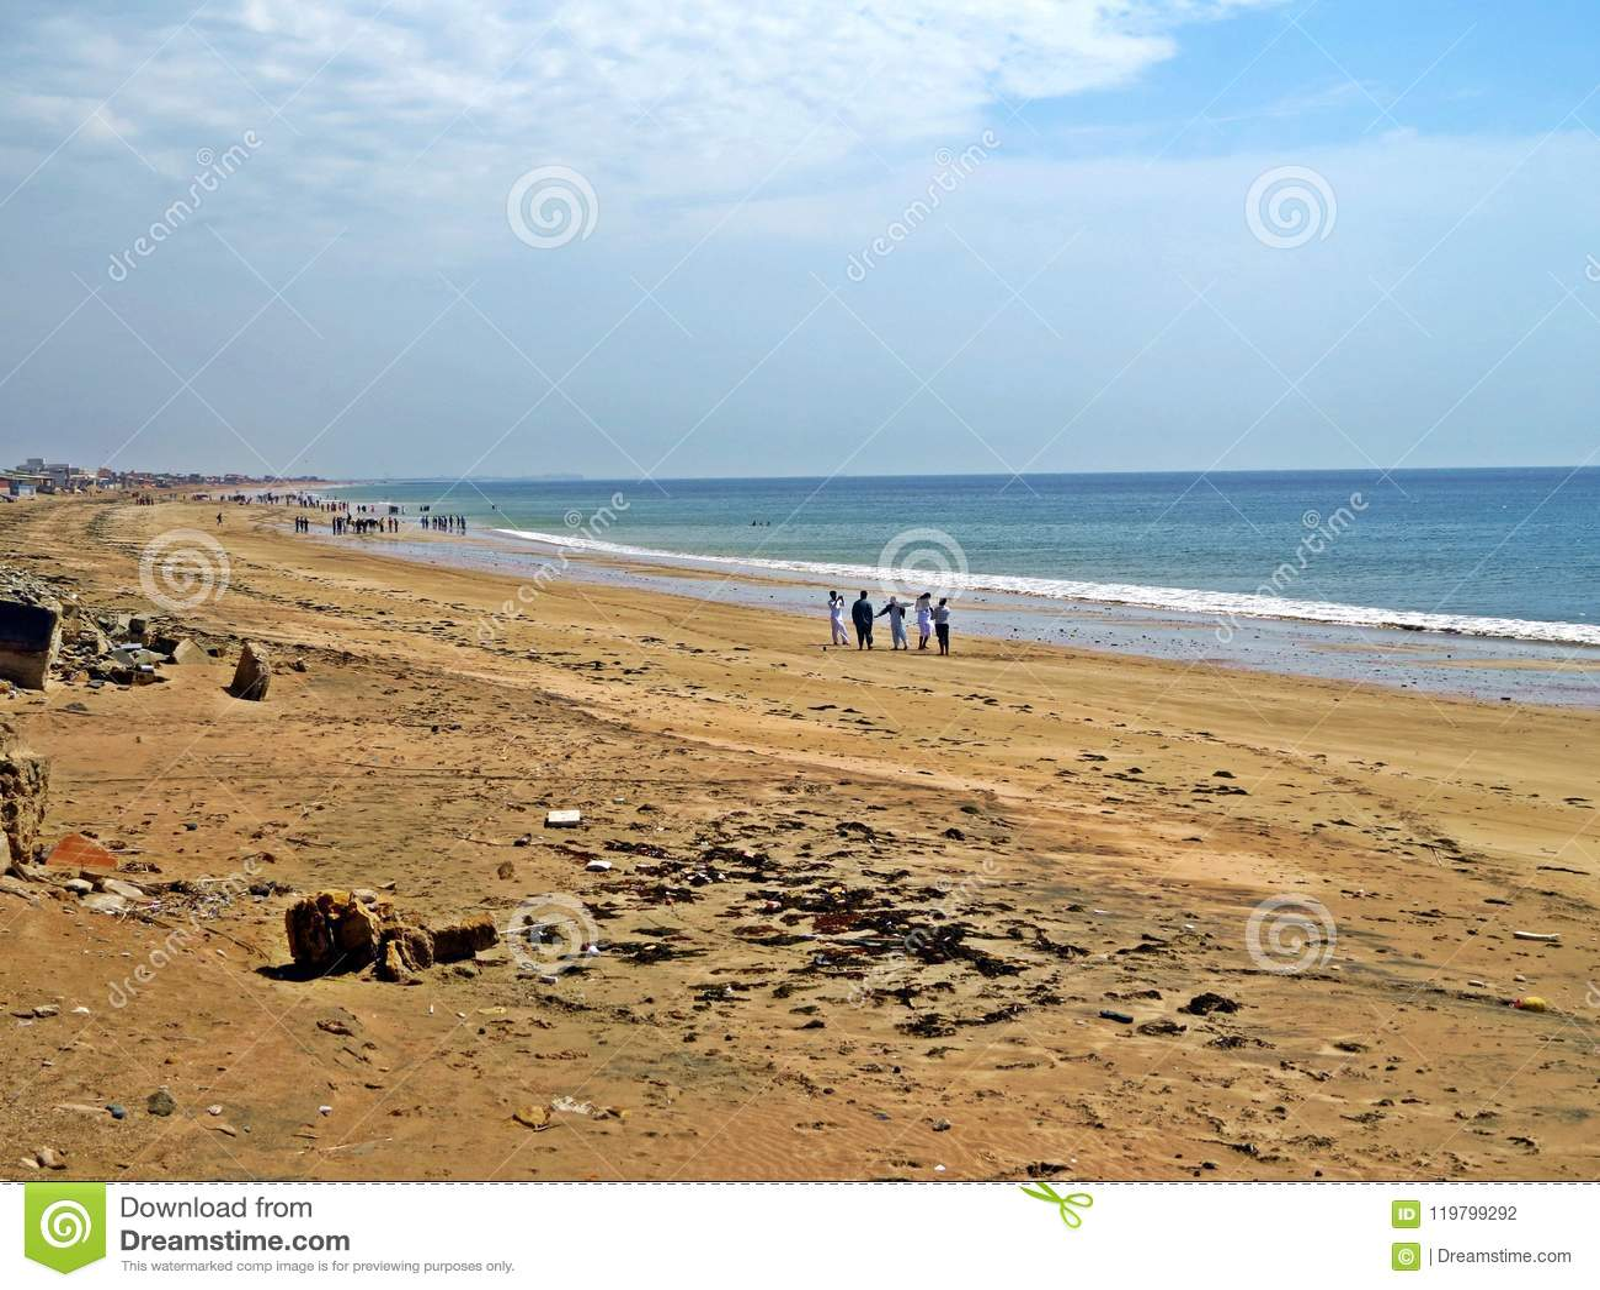 Hawkesbay, Karachi, Arabian Sea, Pakistan Stock Photo